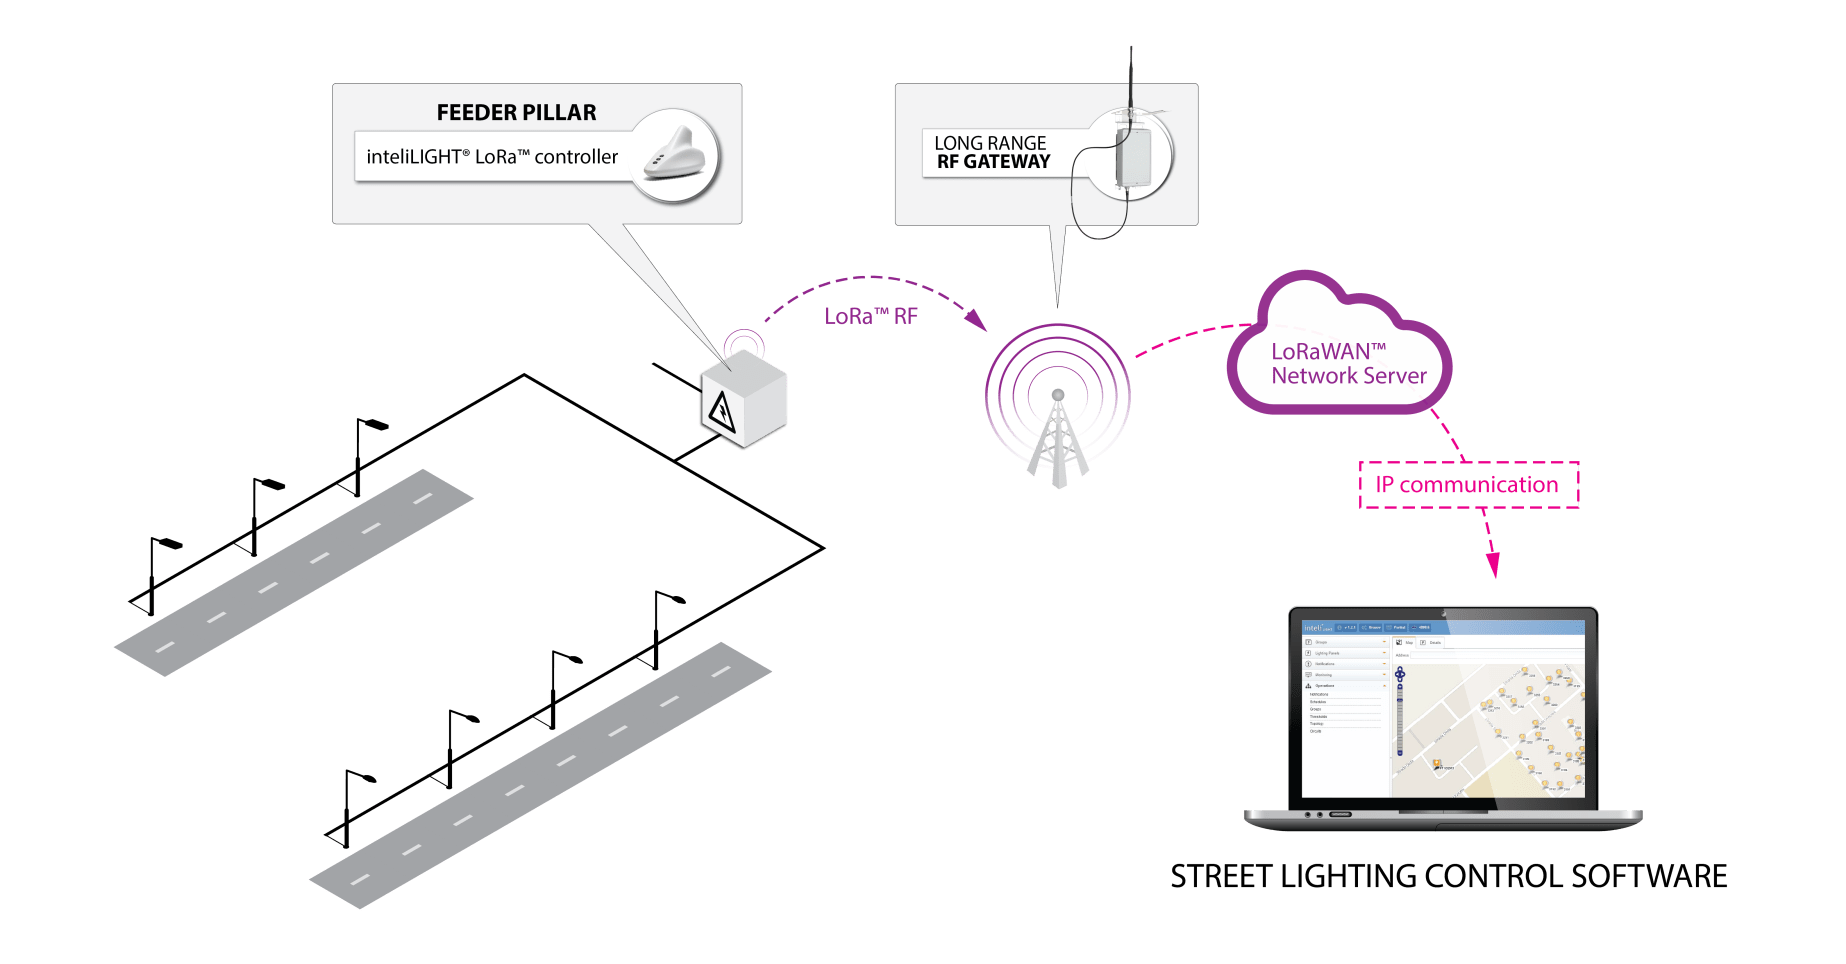 Intelilight Lora Streetlight Management Successfully